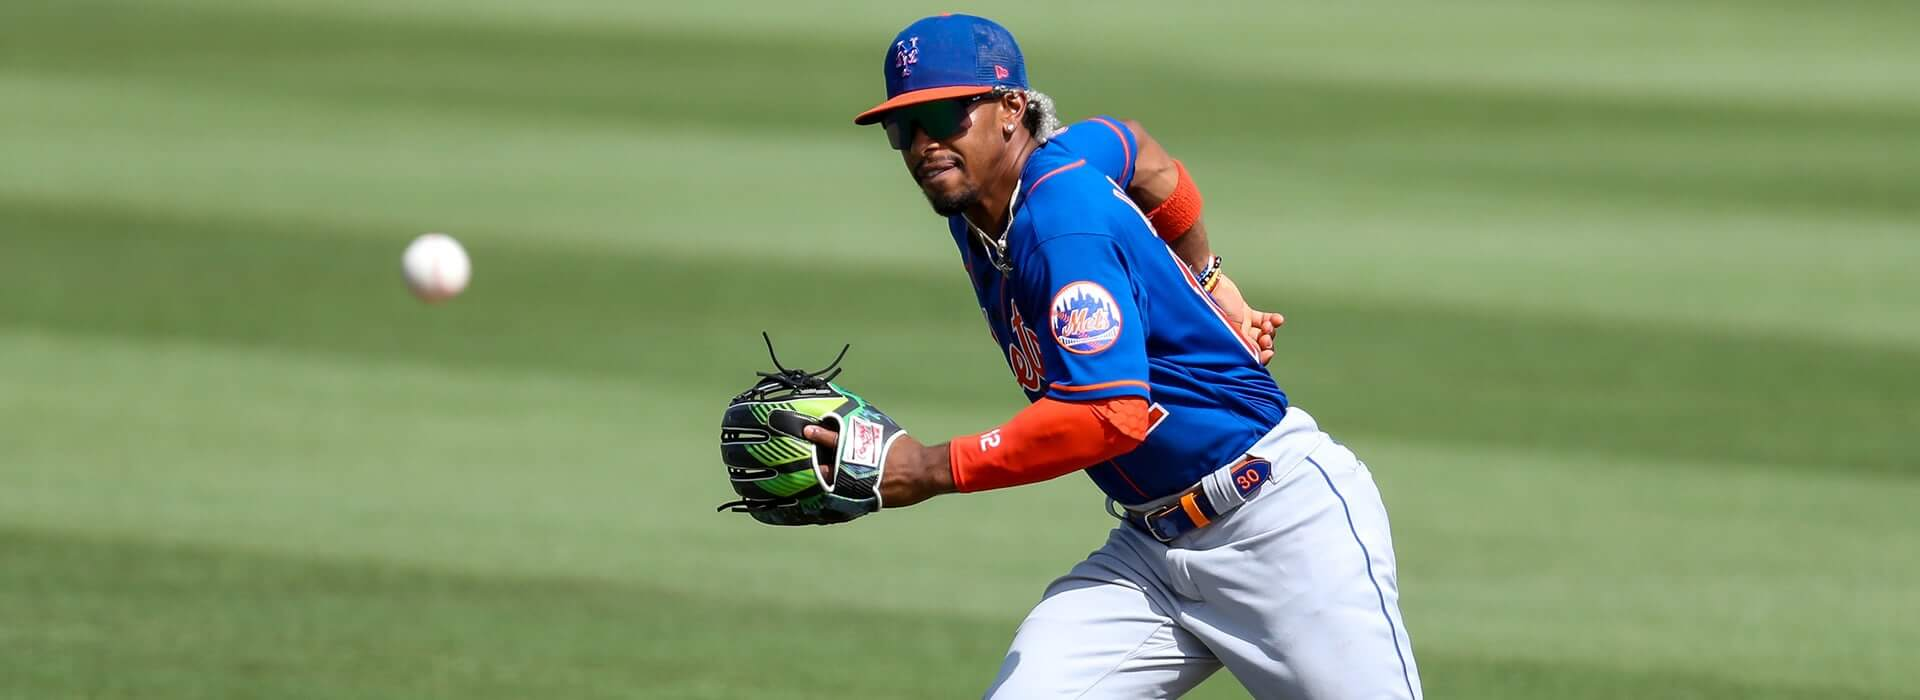 Baseball Glove Gets the AM Treatment